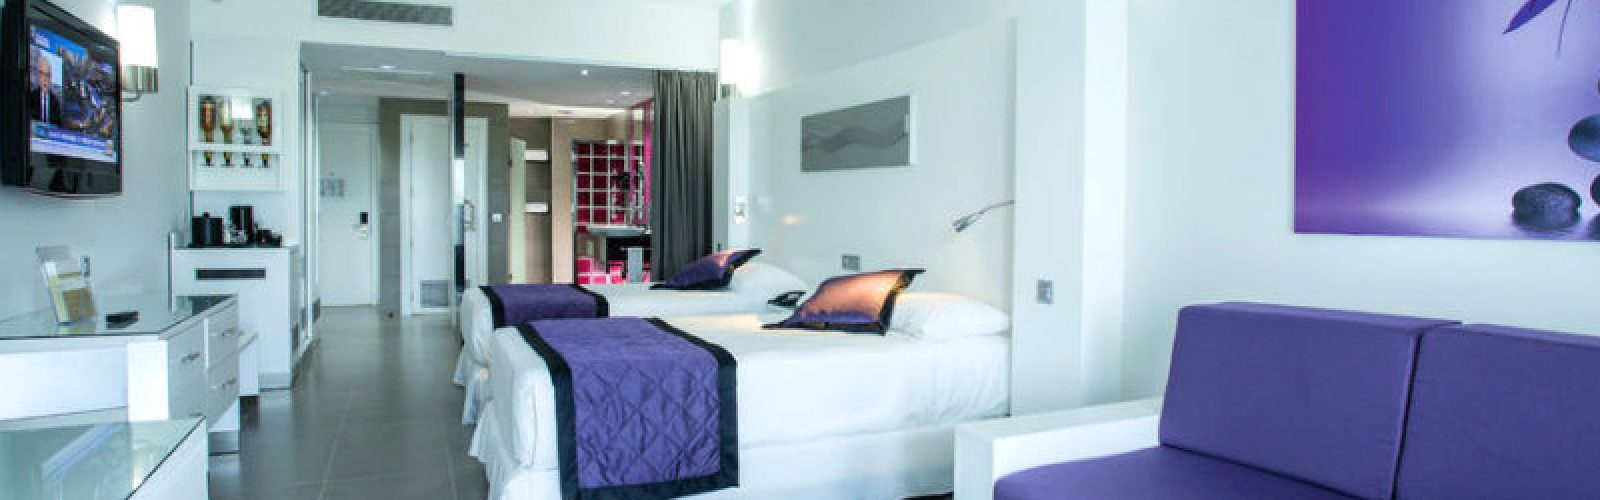 caribbean-world-vacation_riu-palace-mobay-junior-suite-gdn